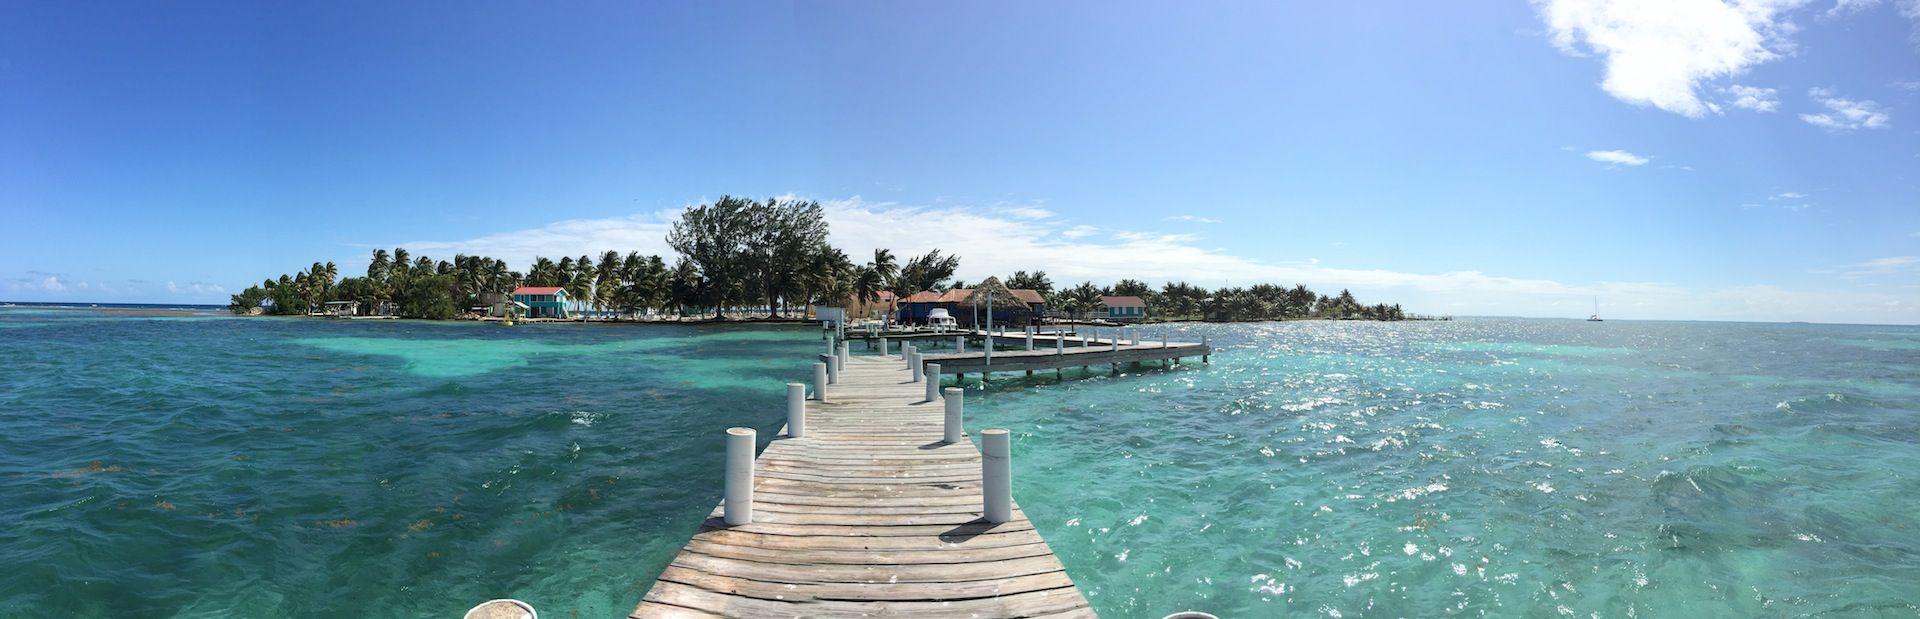 Welcome to Blue Marlin Beach Resort!